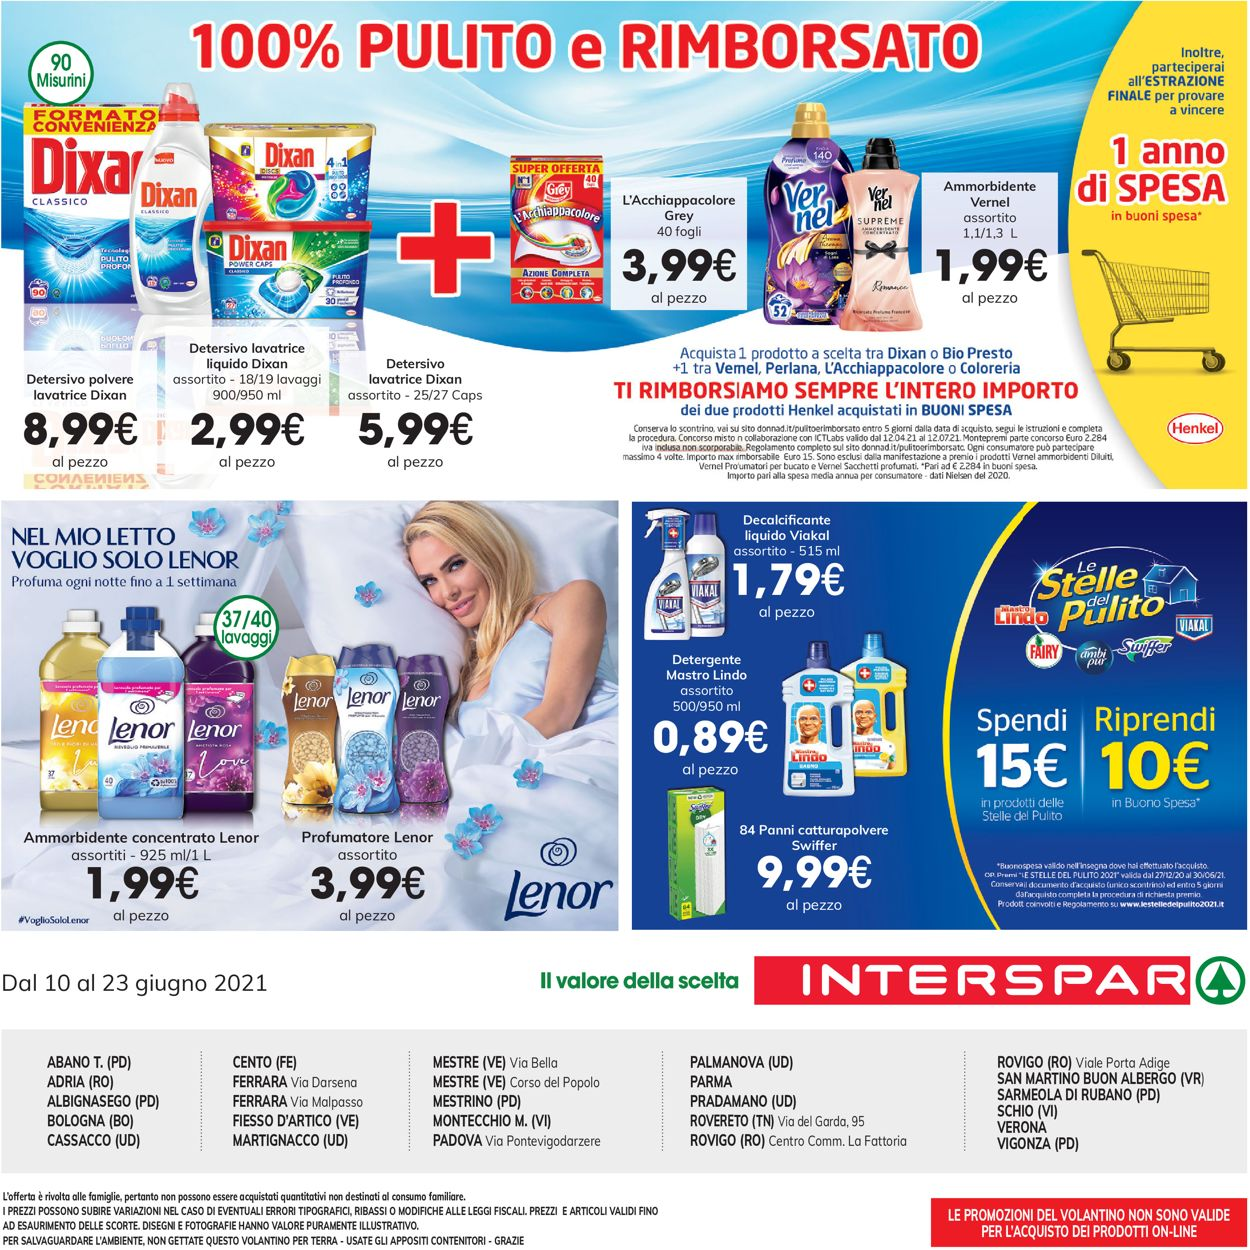 Volantino Interspar - Offerte 10/06-23/06/2021 (Pagina 16)